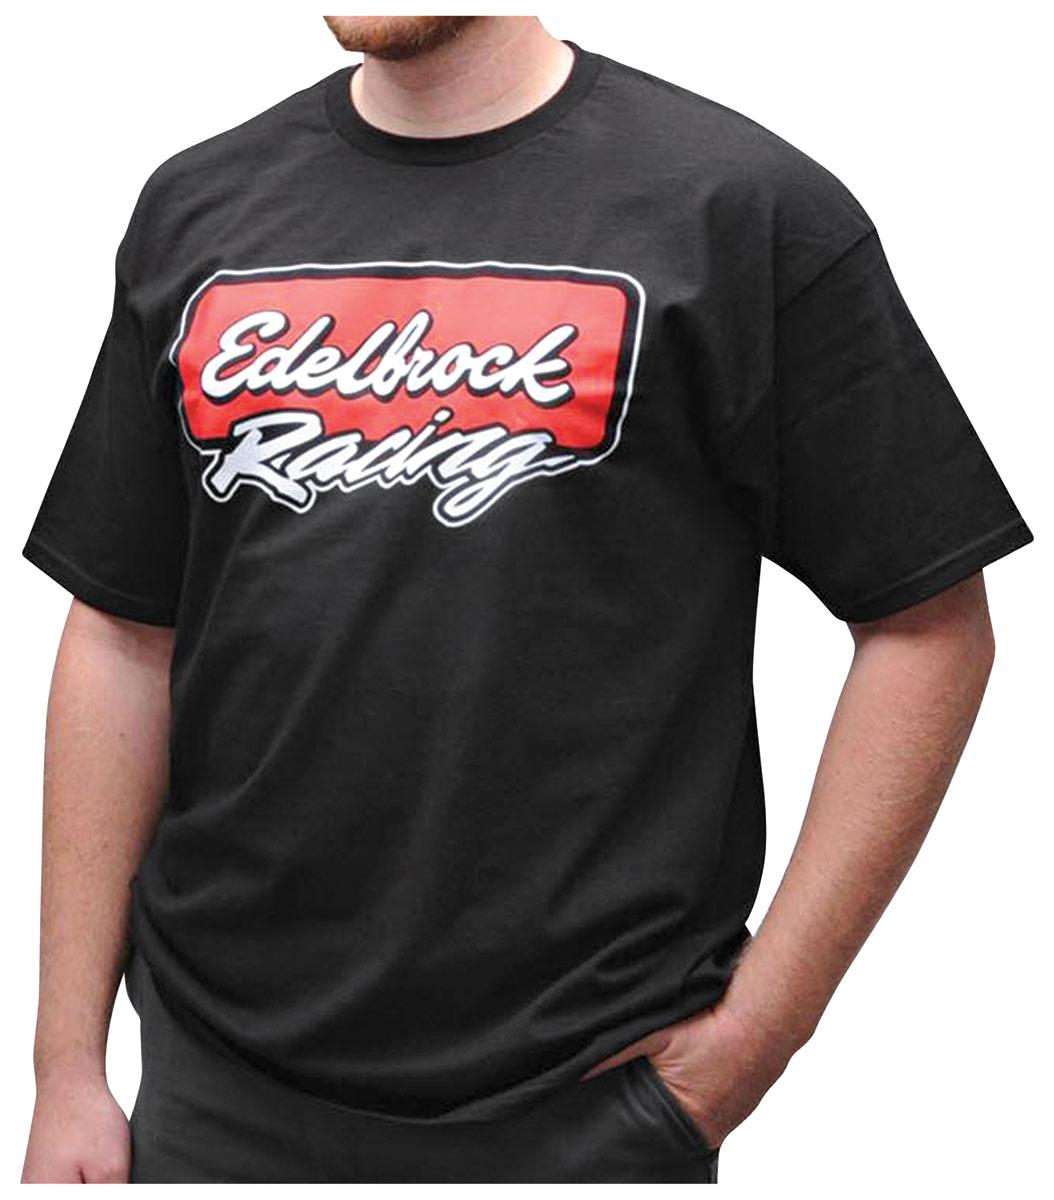 Shirt, Edelbrock Racing, Black